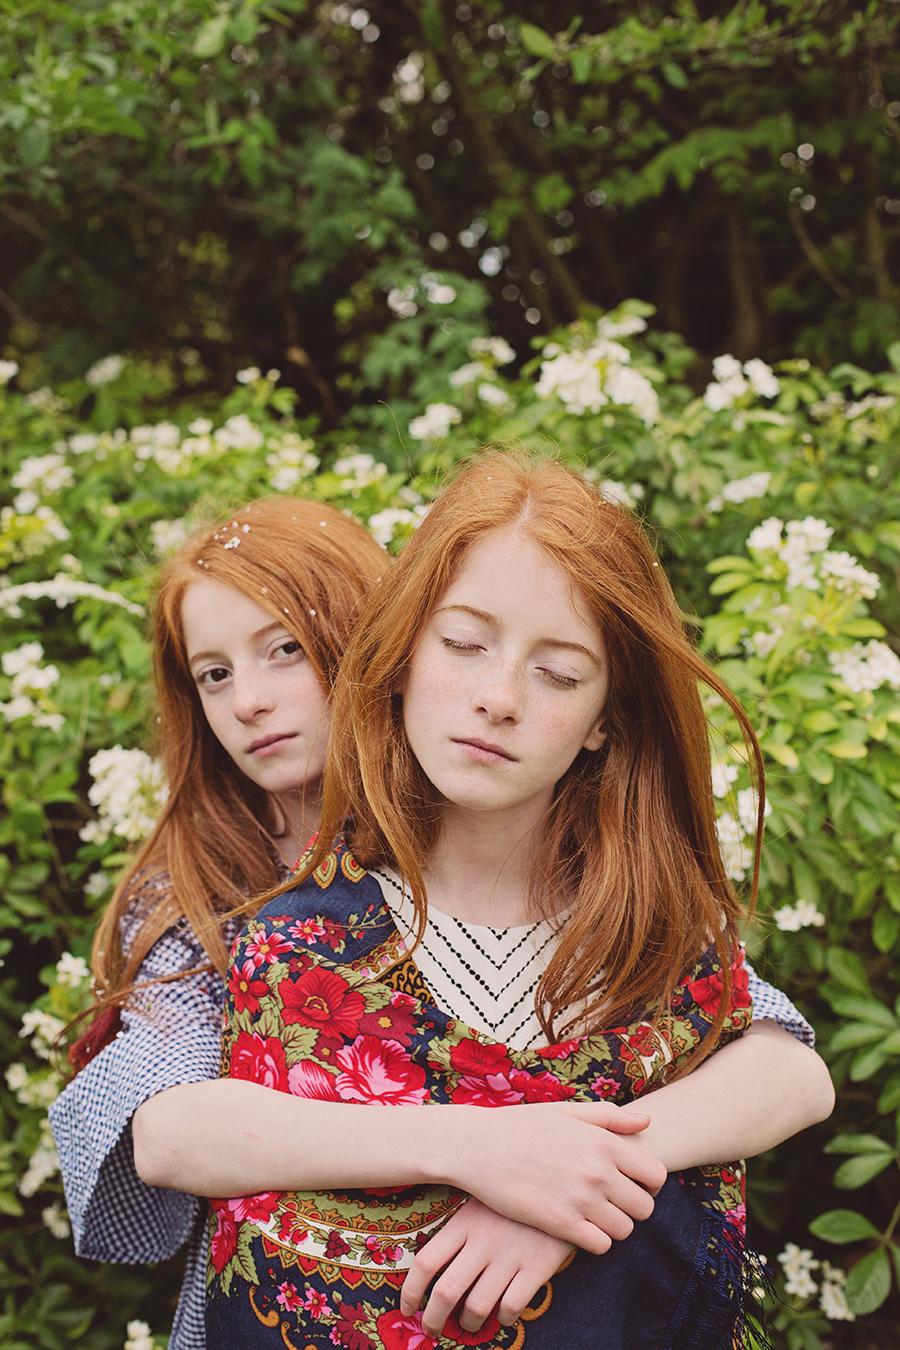 BABIEKINS MAGAZINE | Spring Again